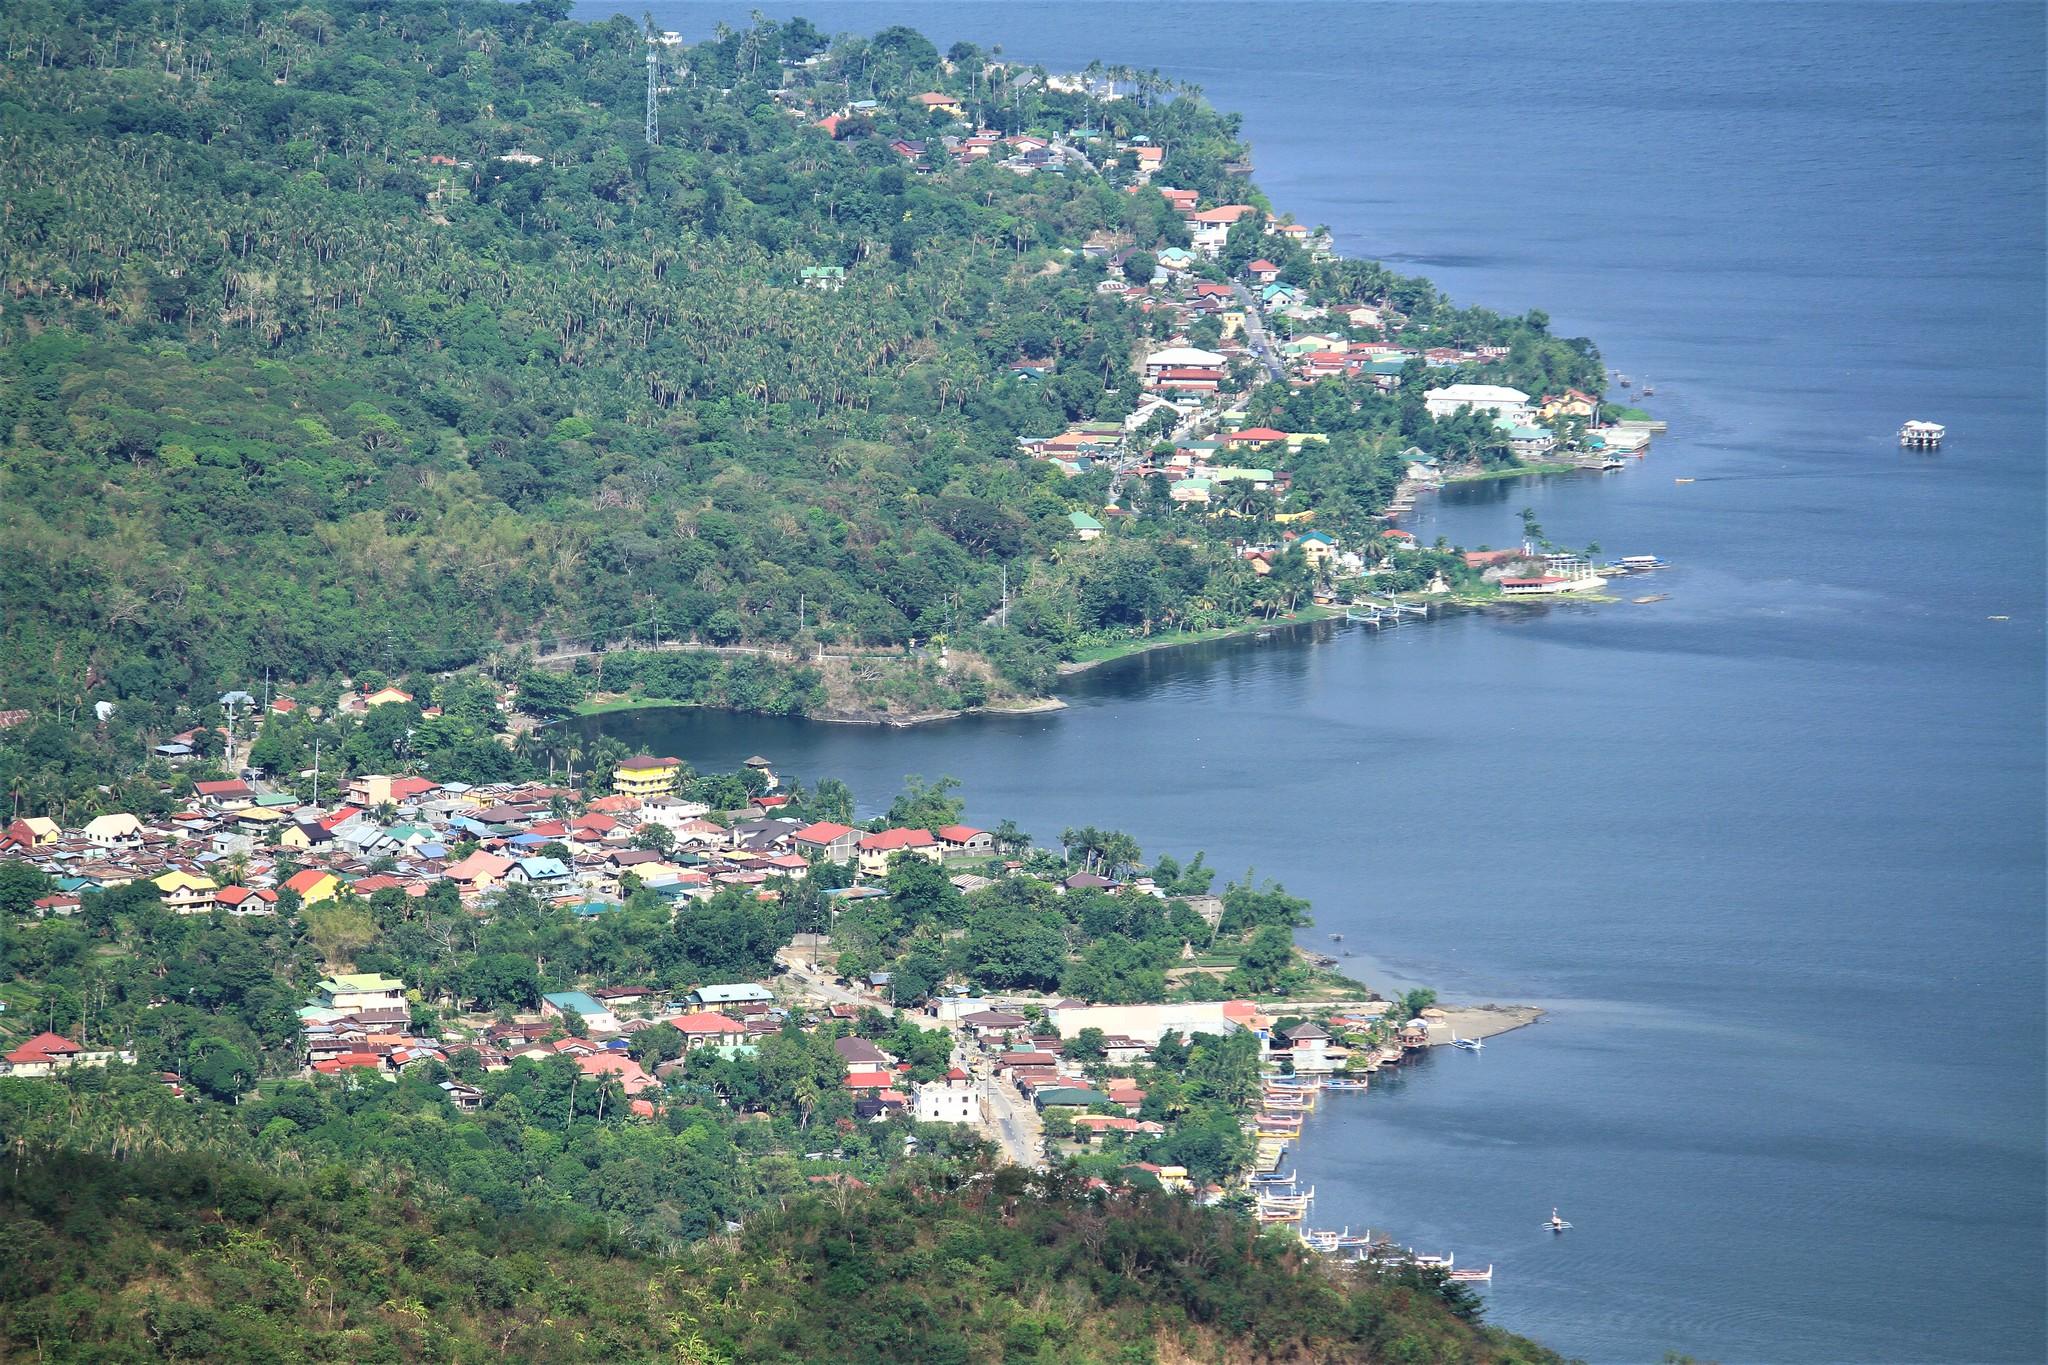 Coastal village, The Philippines